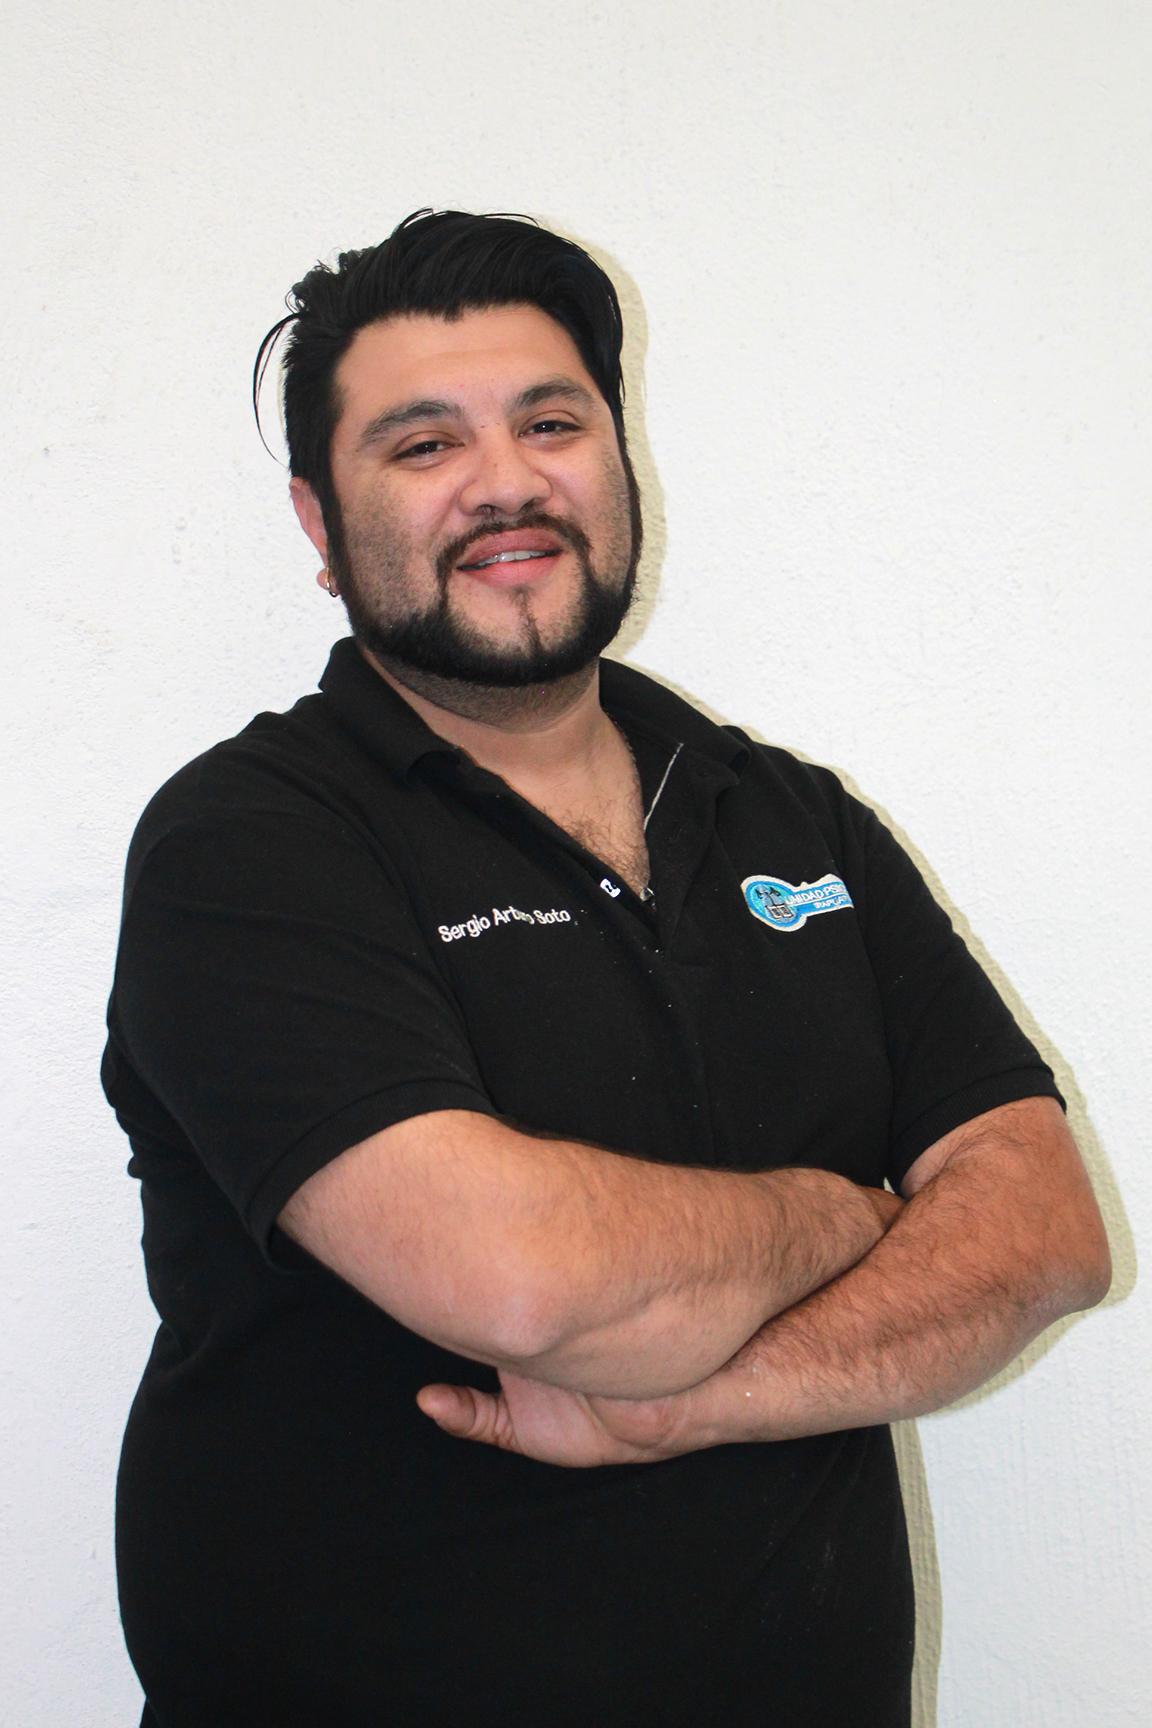 Sergio Arturo Soto Mosqueda